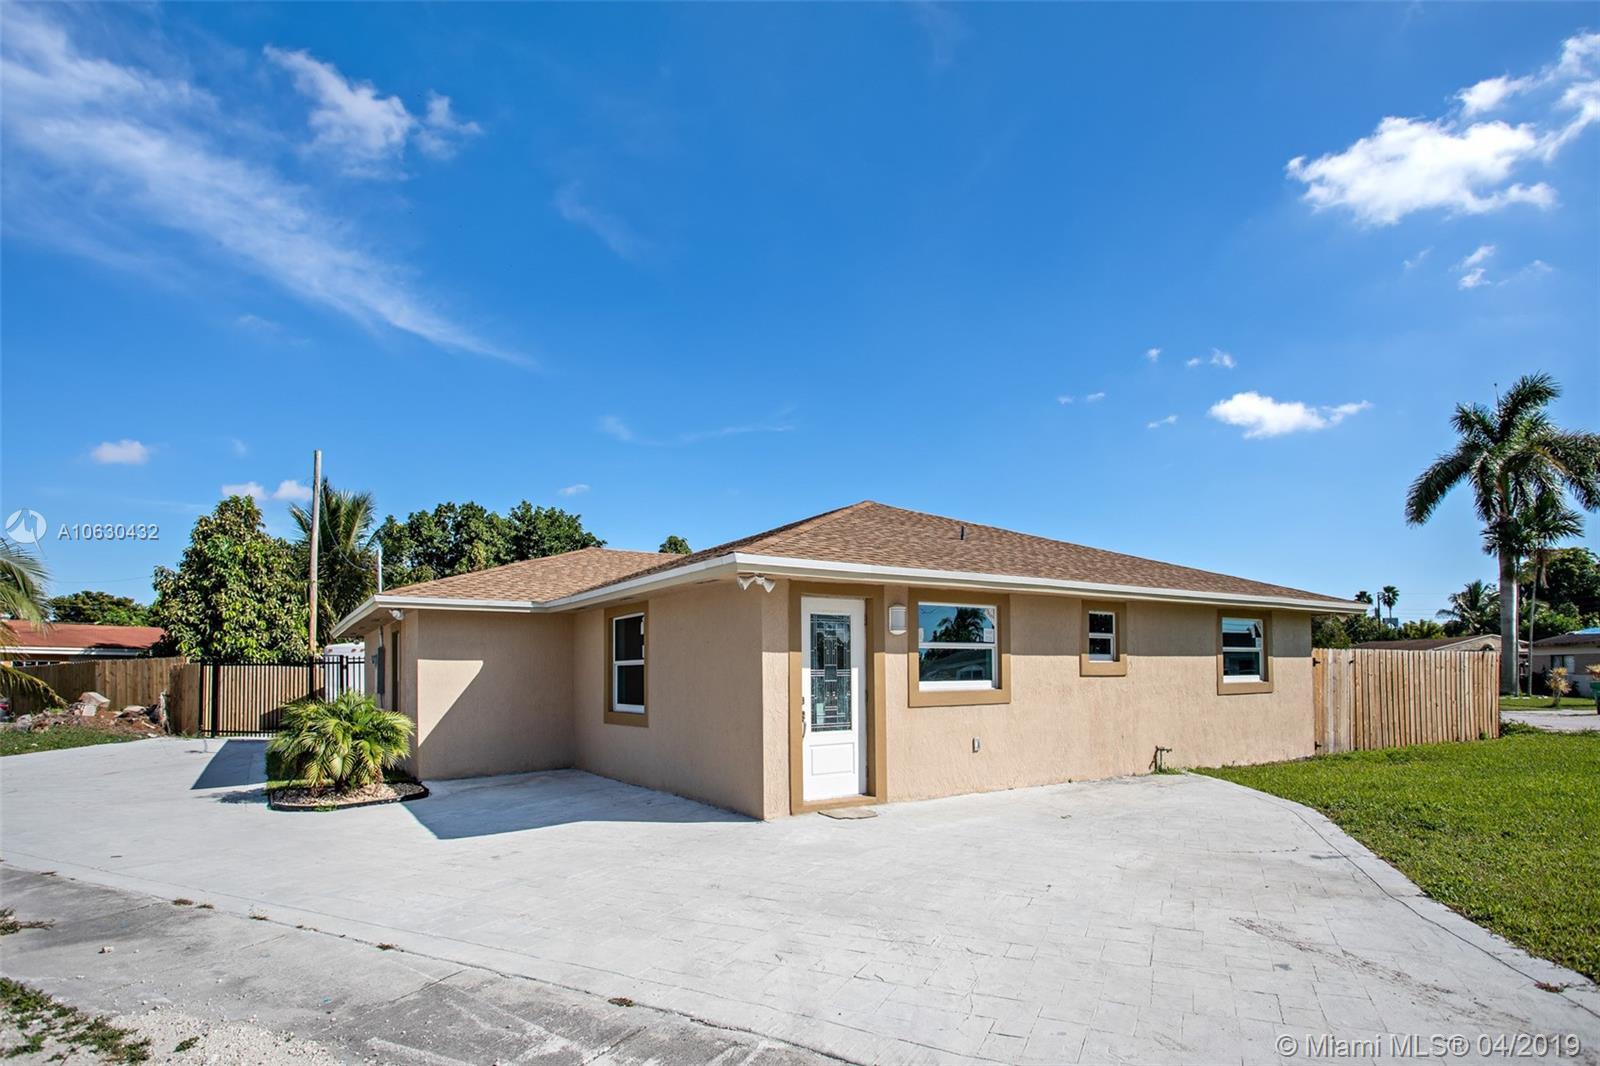 6971 SW 23rd St, Miramar, Florida